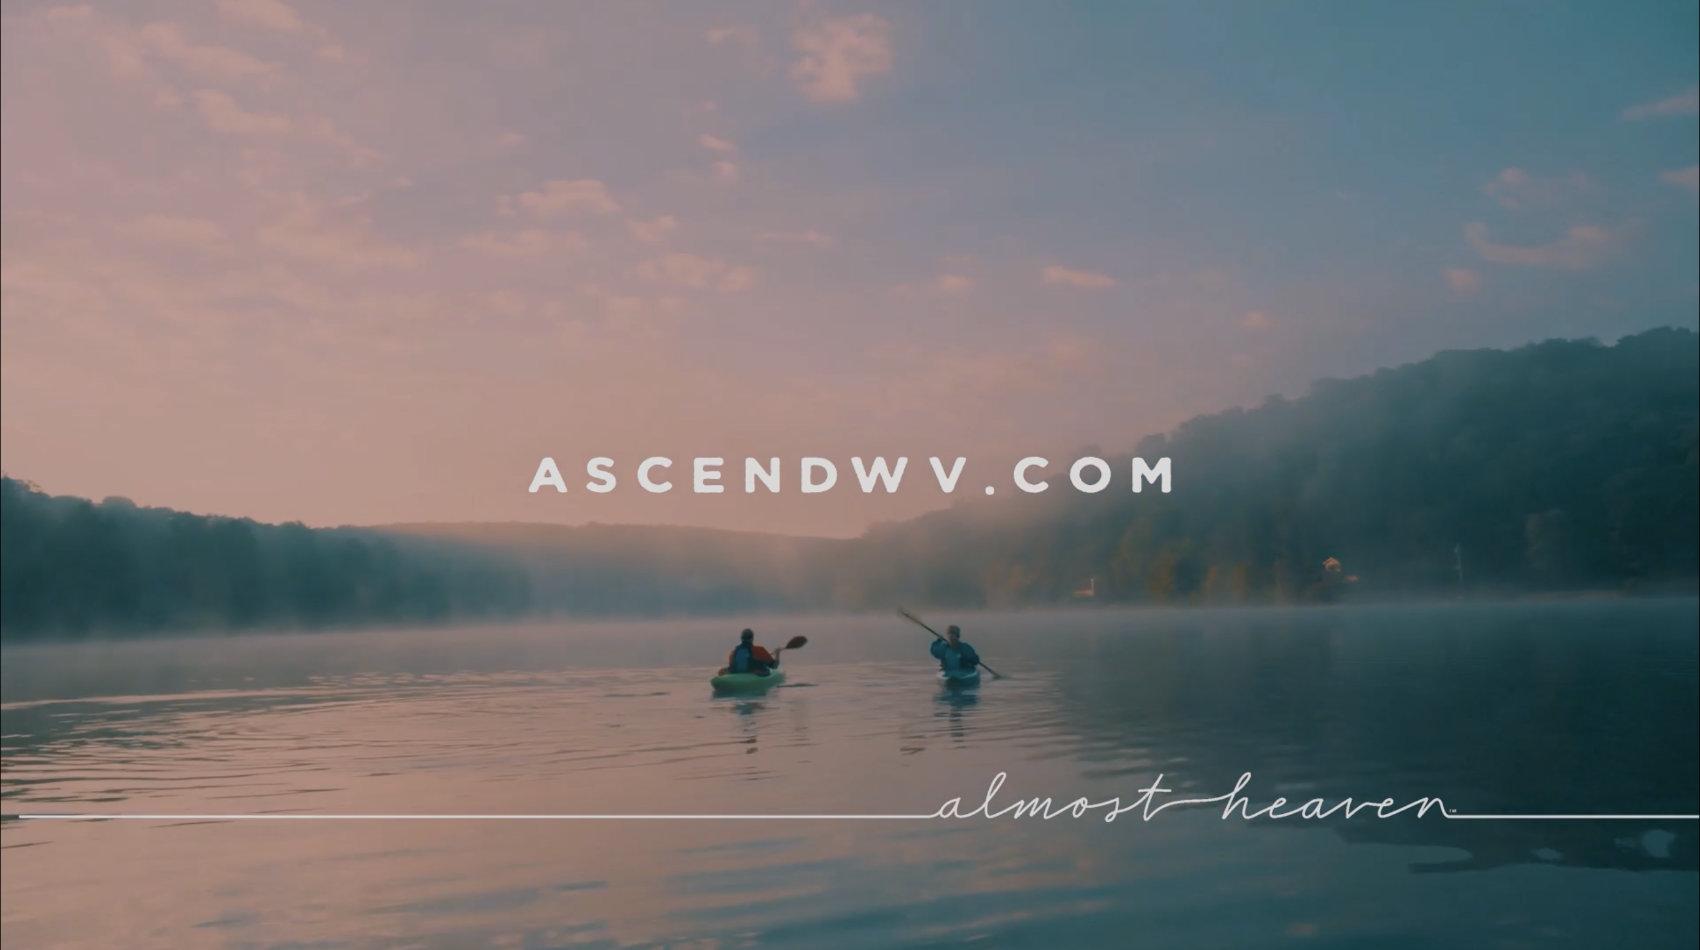 Ascend WV